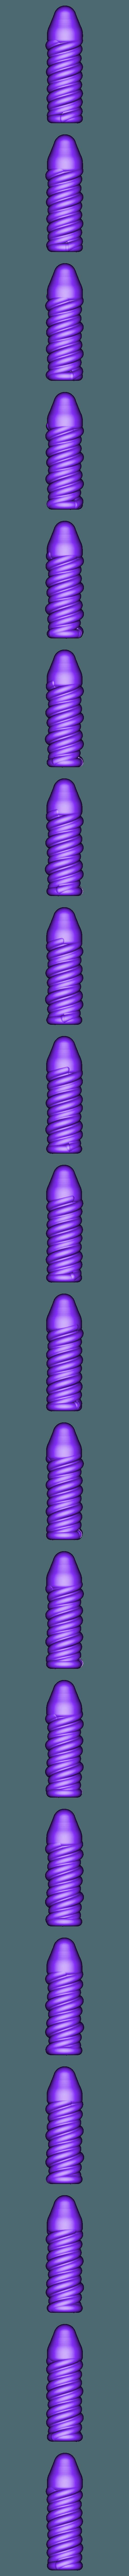 Spiral.stl Download free STL file Spiral • Object to 3D print, itsallinyourhead1